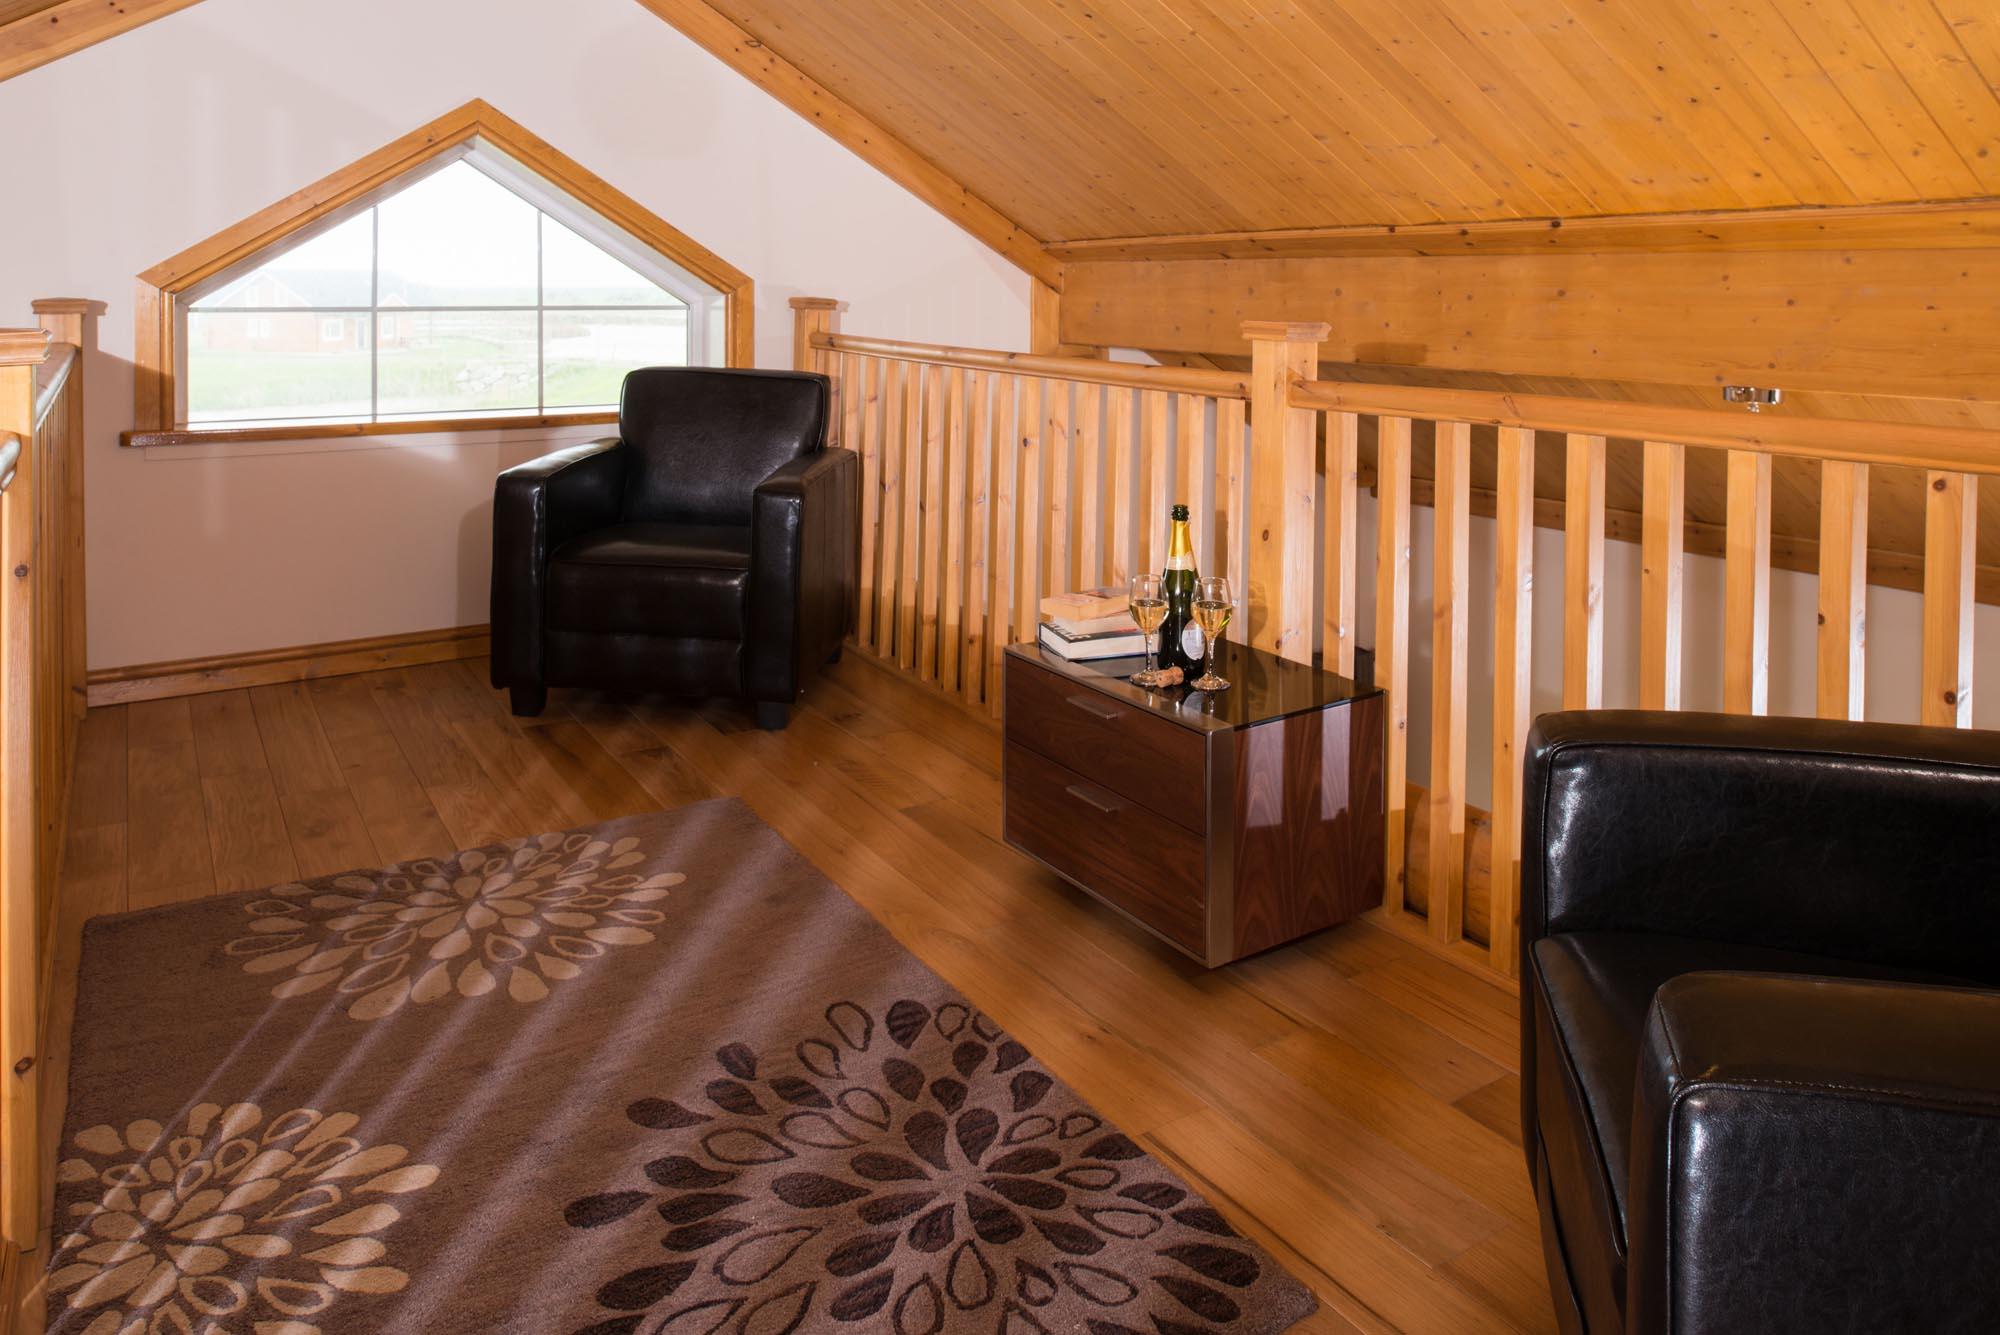 luxury lodges east yorkshire, Hot tub lodge Yorkshire, hoseasons